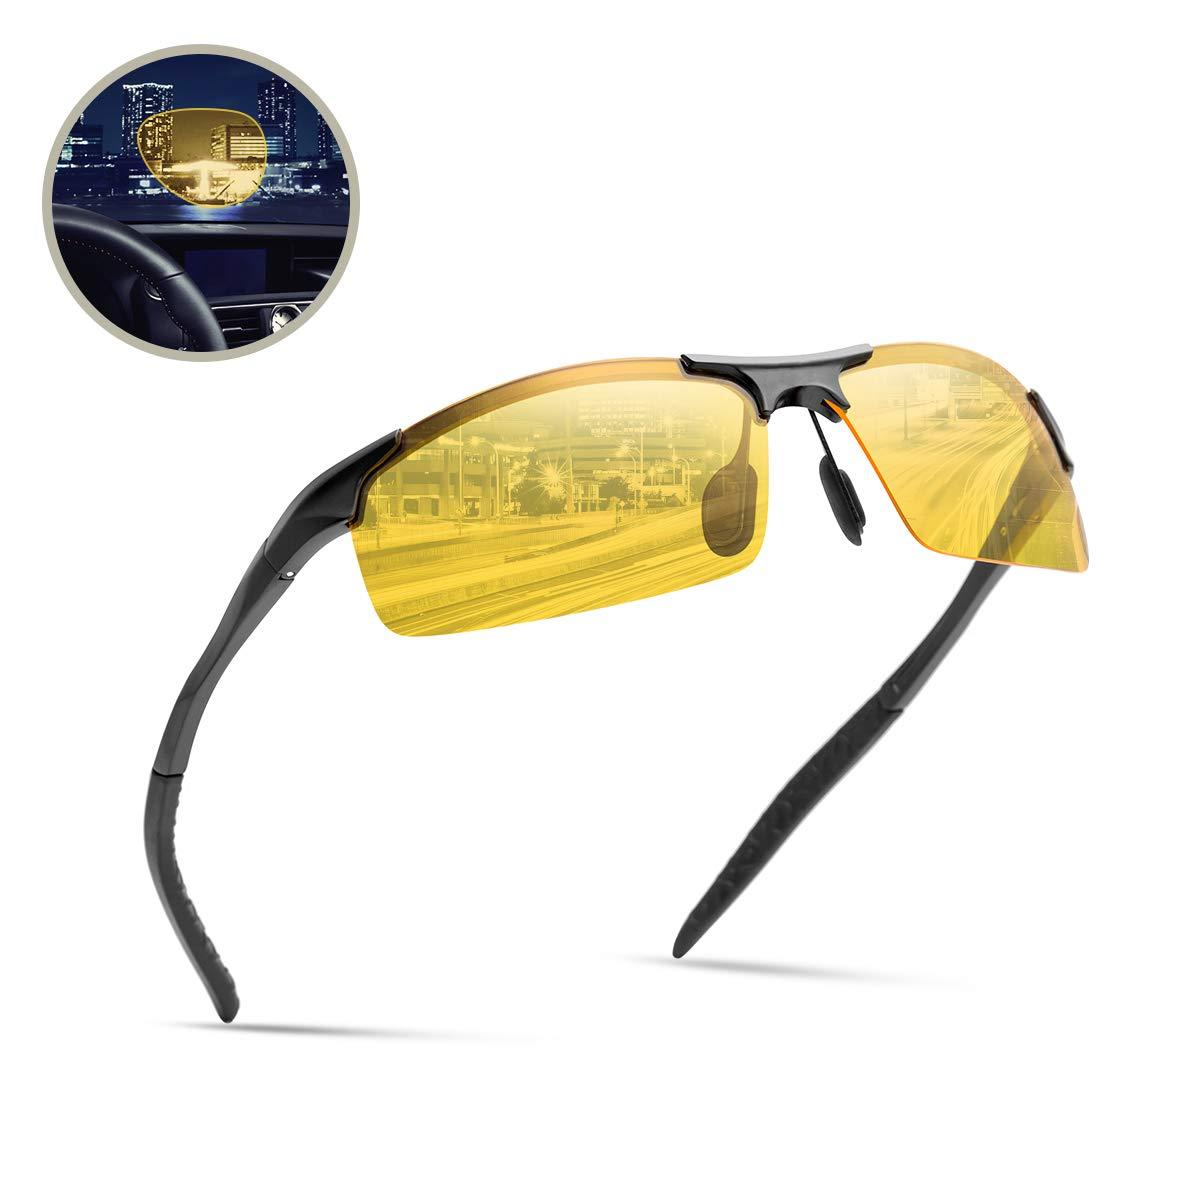 Surenue night driving glasses anti glare sport polarizedYellow Tint Polycarbonate Lens Safety Sunglasses Men Women (Black-YS)